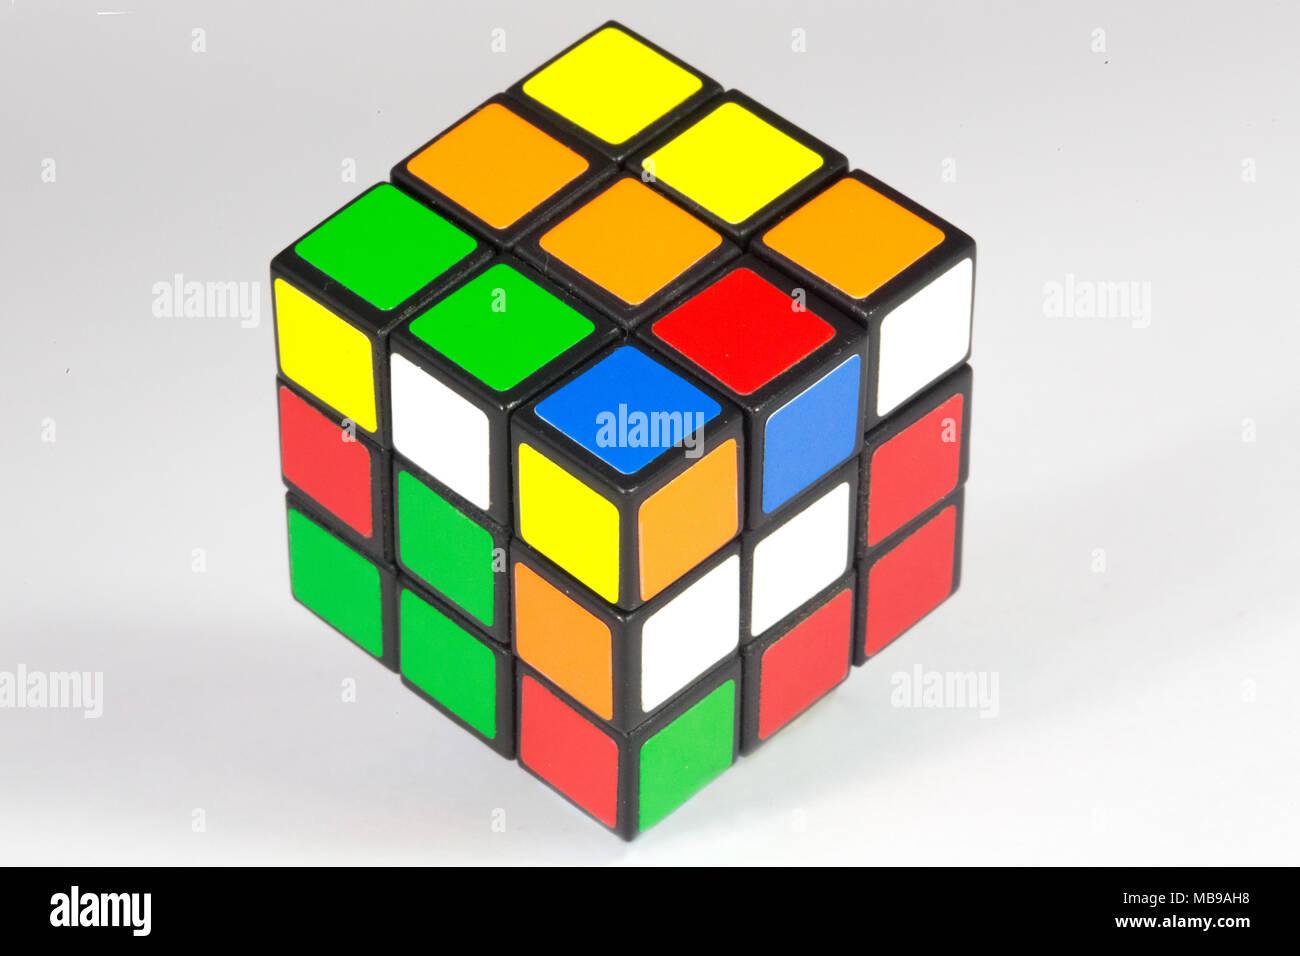 Kids Puzzles Stock Photos Images Alamy Zz Magic Cube A Rubiks Originally Is 3 D Combination Puzzle